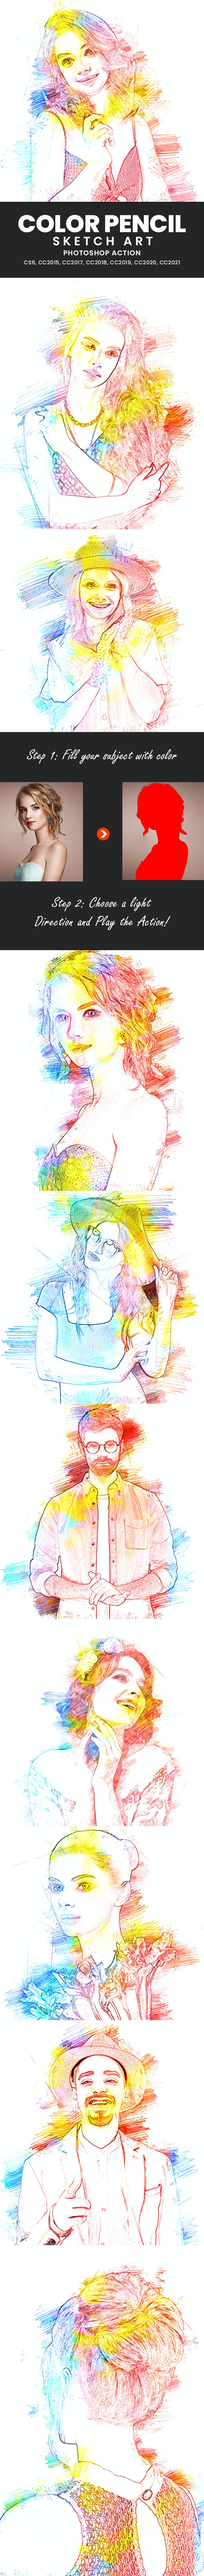 Color Pencil Sketch Art Photoshop Action - Photo Effects Actions